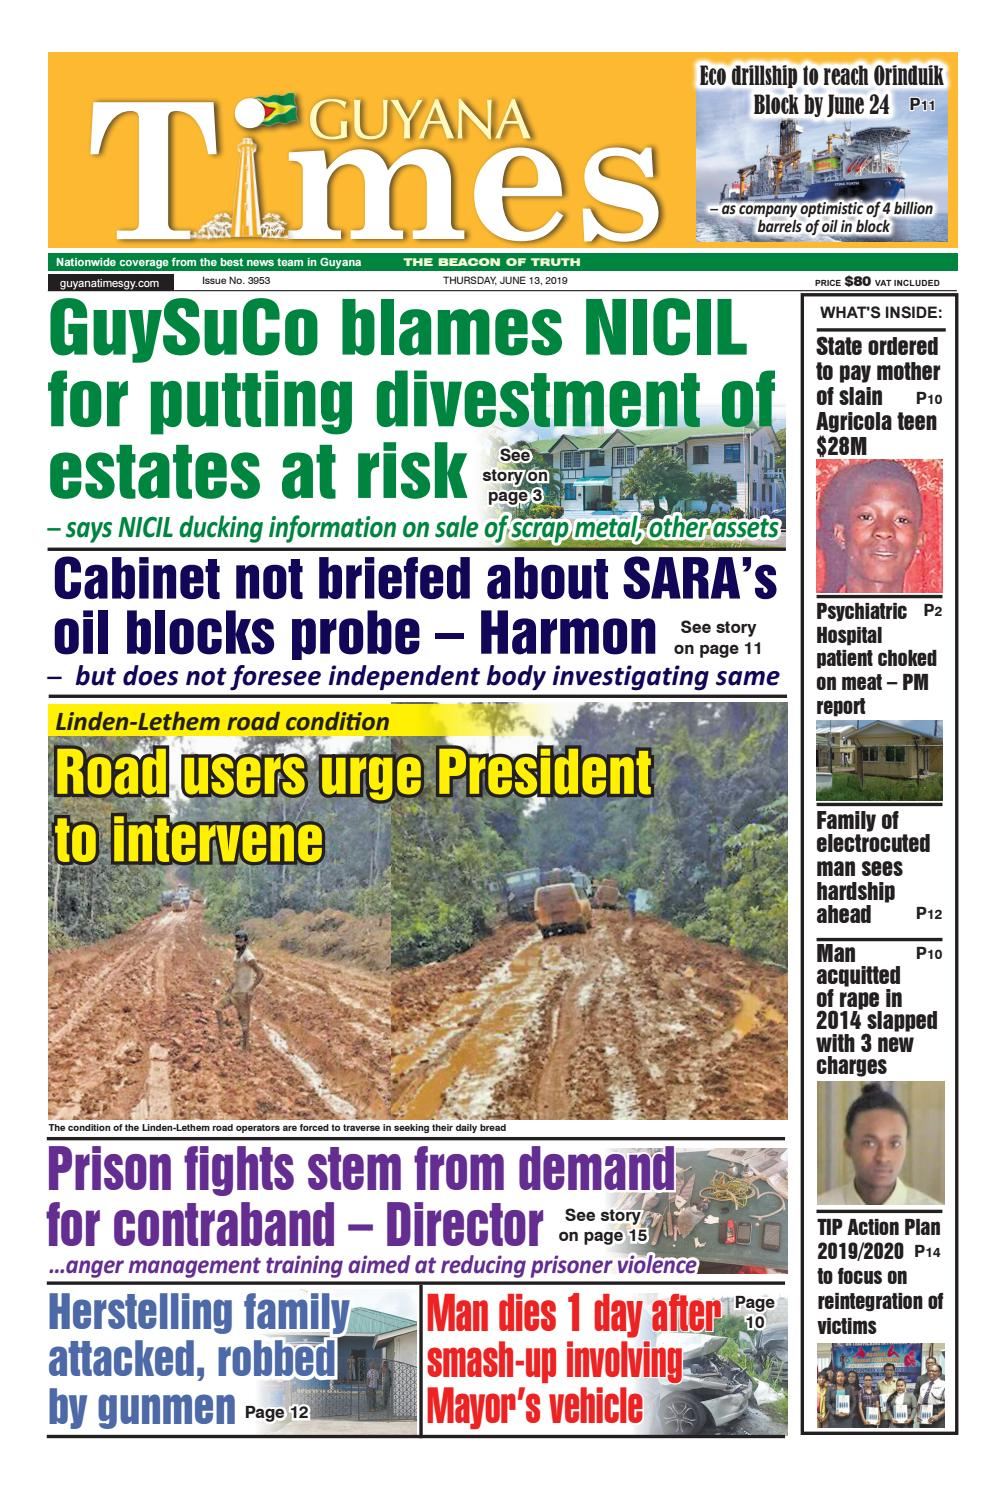 Guyana Times Thursday June 13, 2019 by Gytimes - issuu